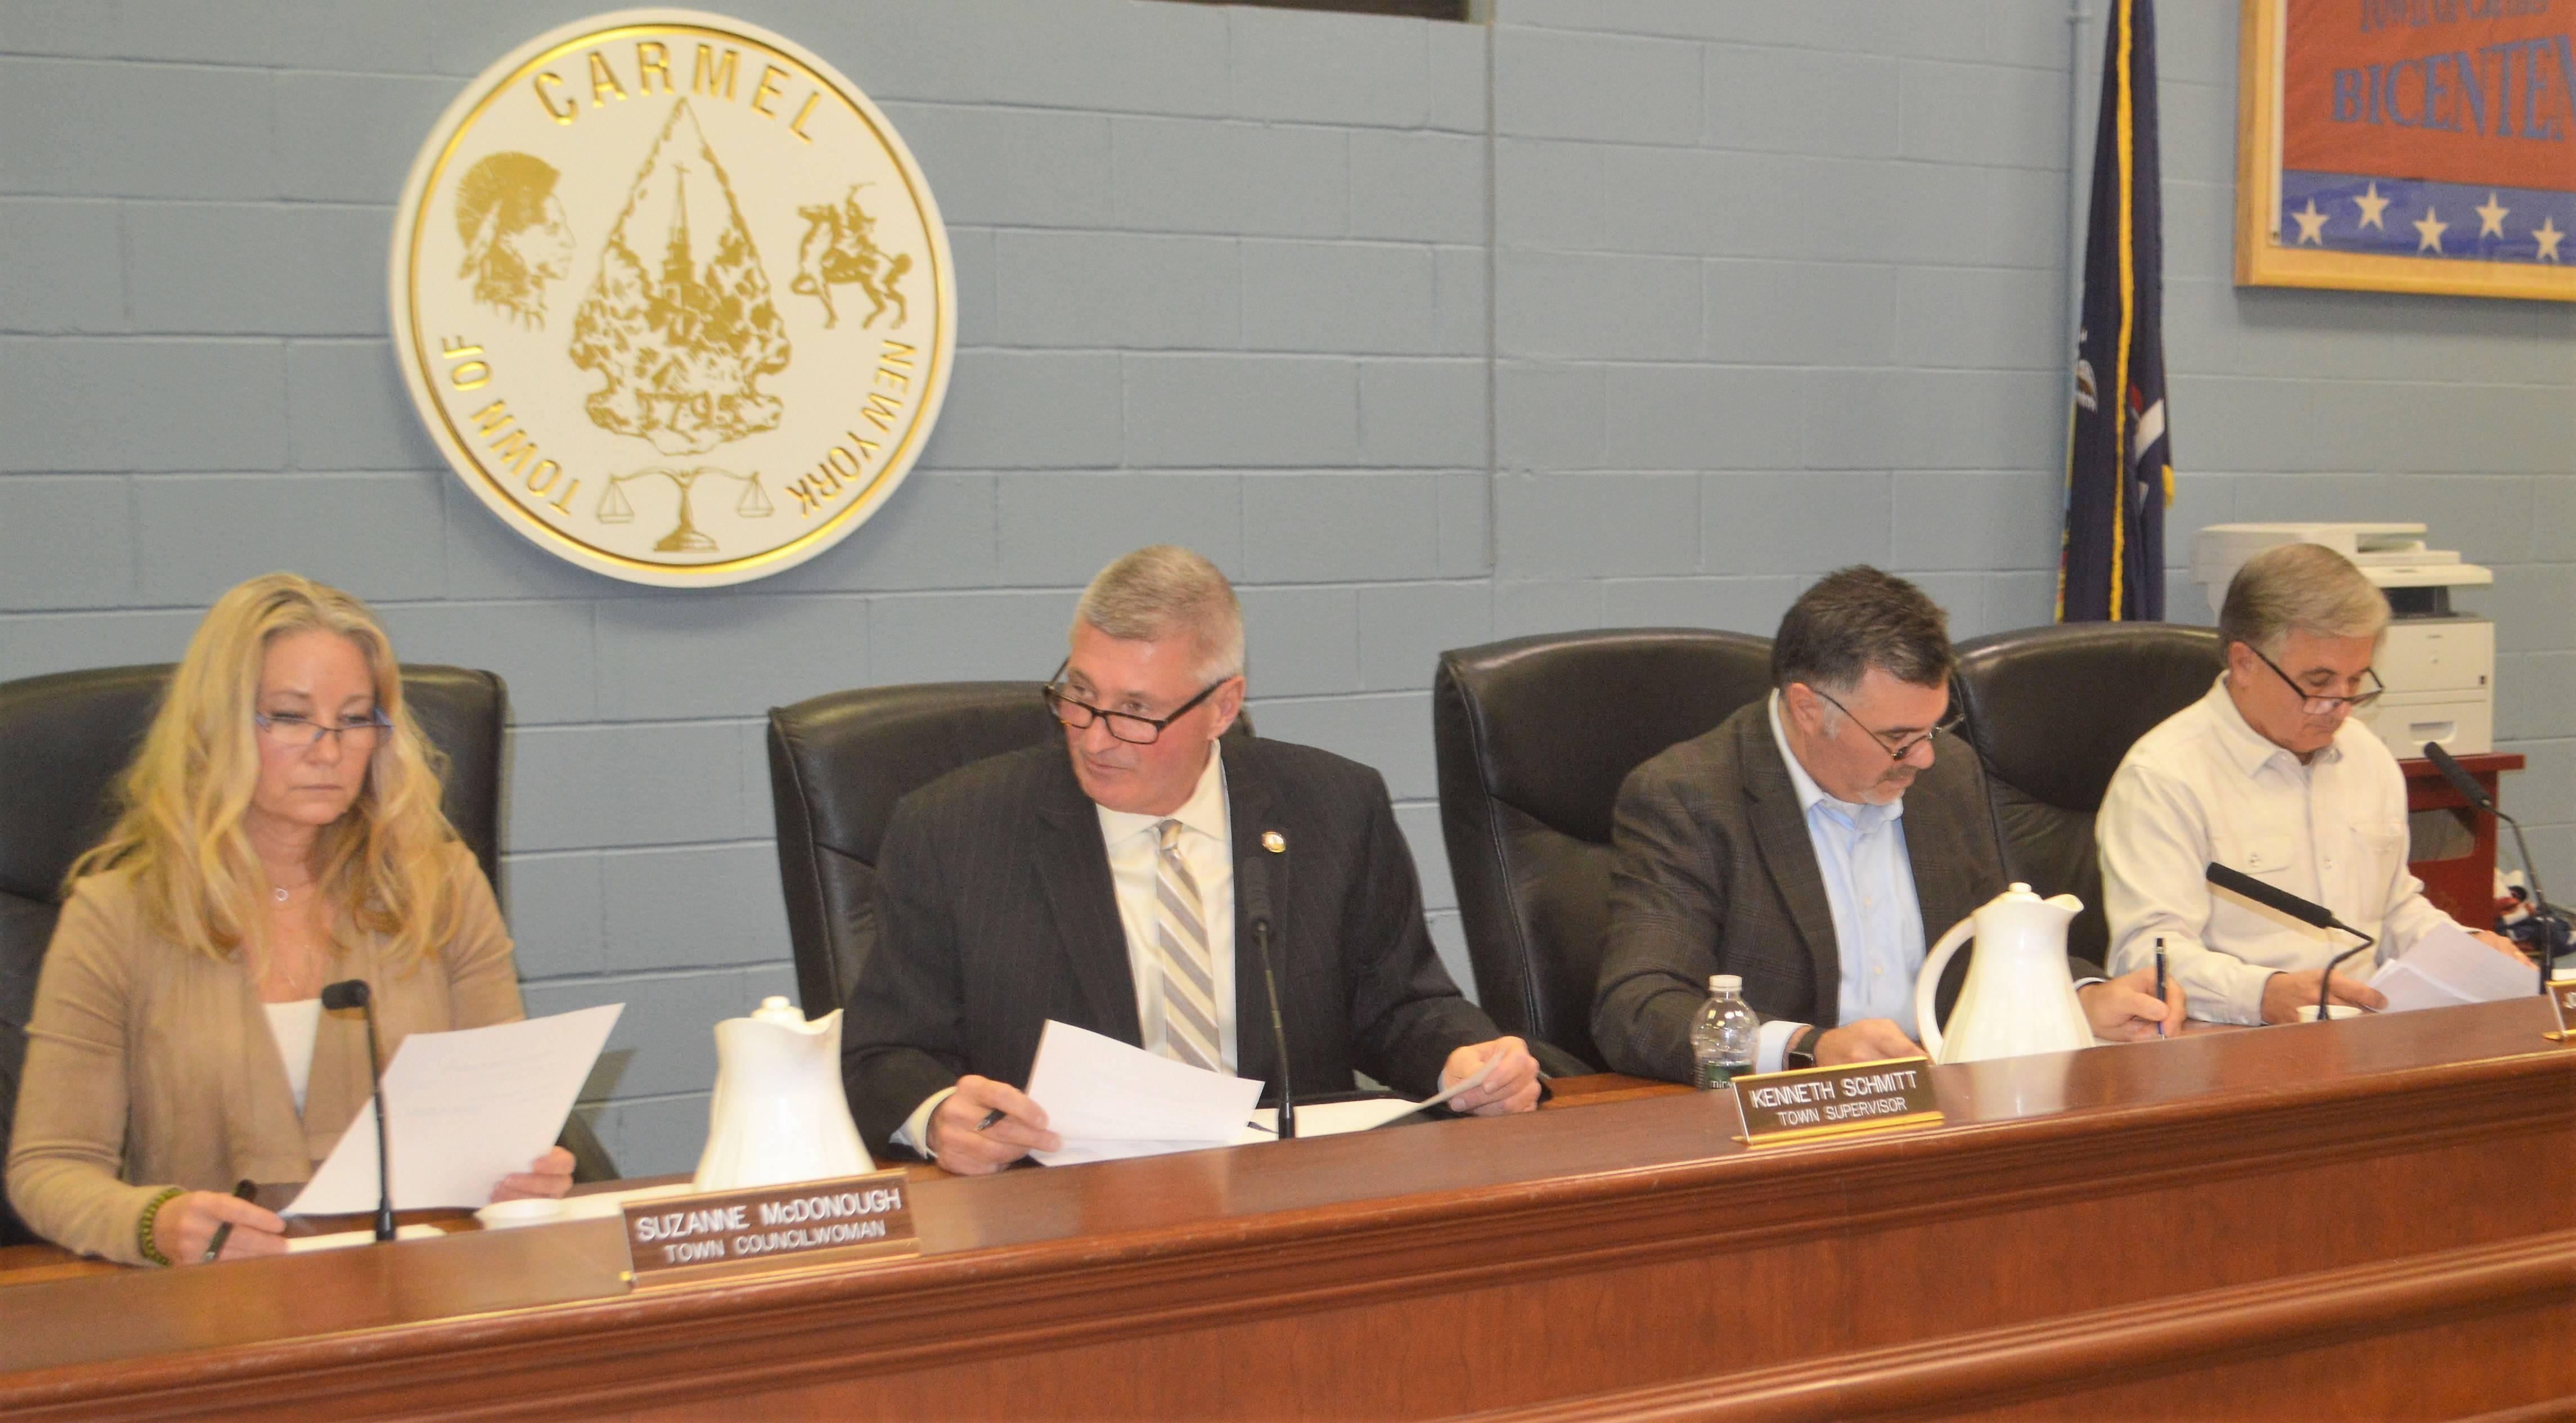 Town May Call for Temporary Vape Shop Moratorium